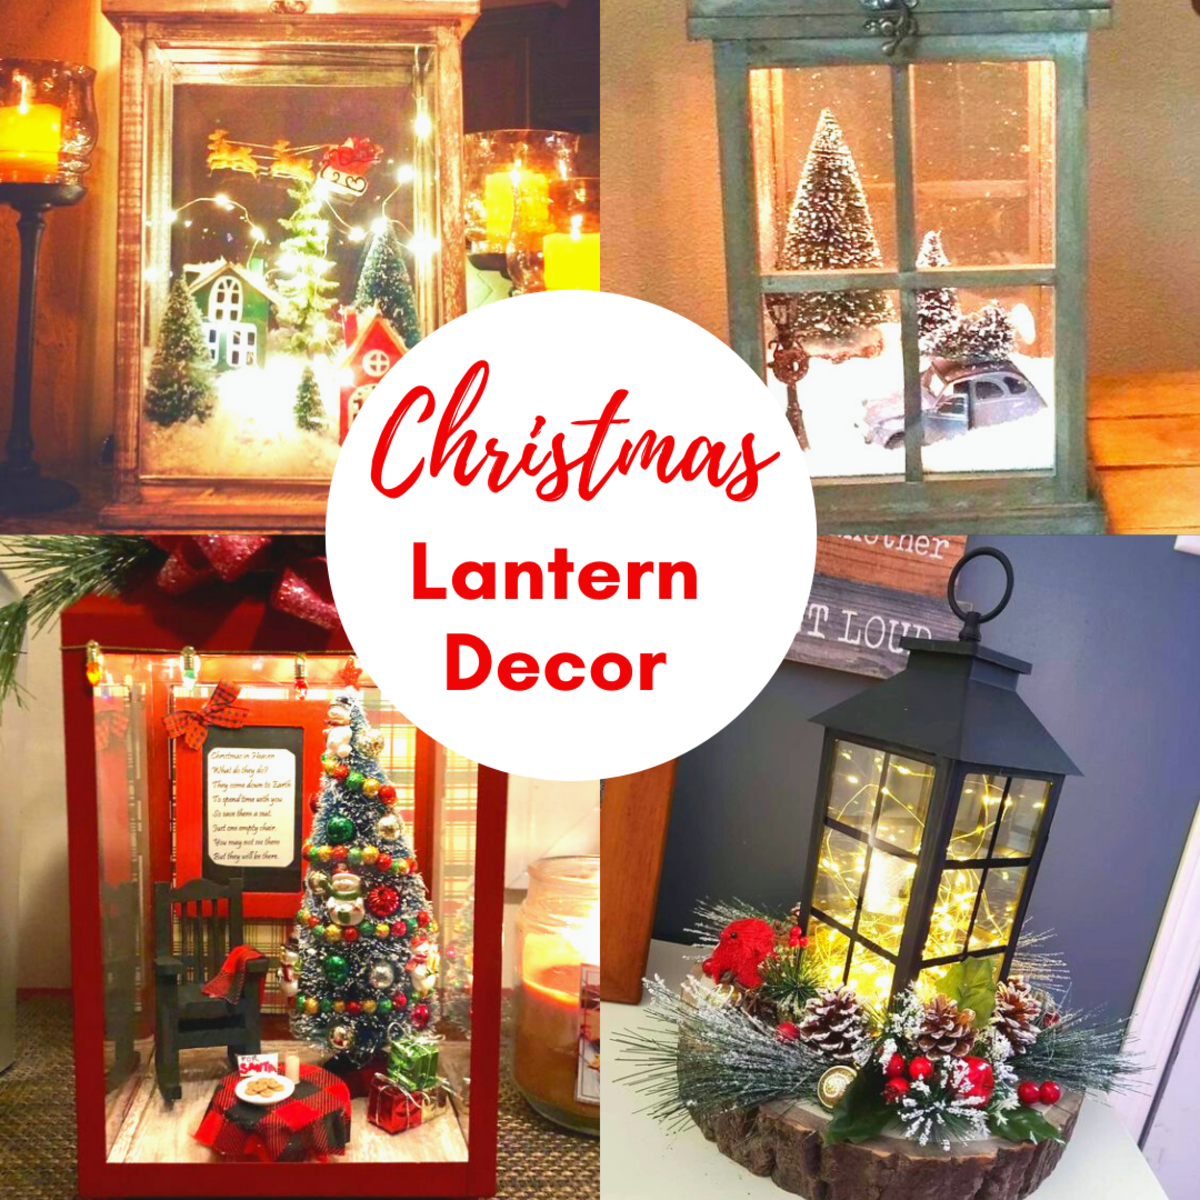 Christmas Lantern Decor Ideas